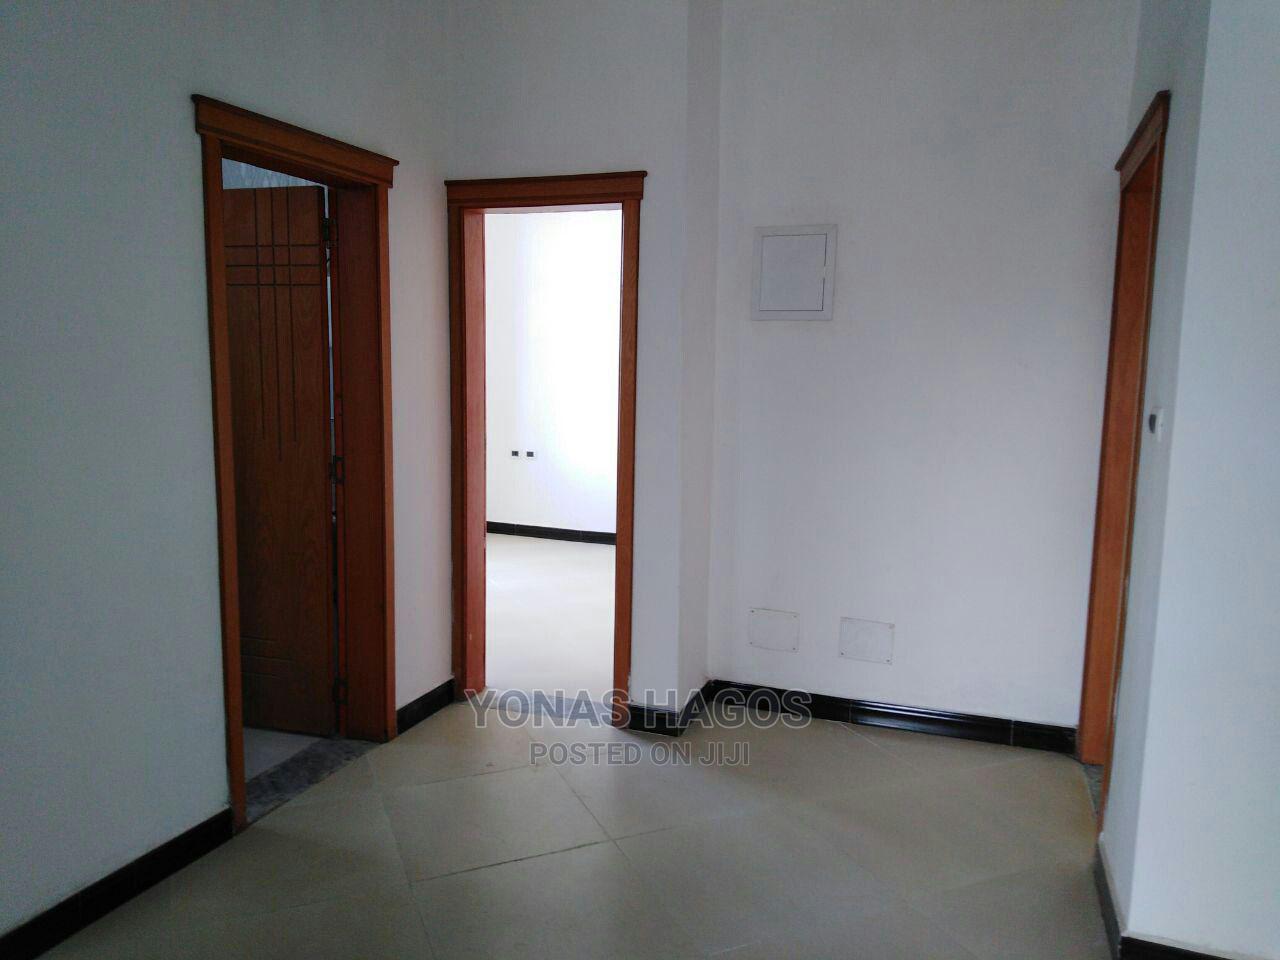 3bdrm Villa in ኤመራልድ, Bole for Sale | Houses & Apartments For Sale for sale in Bole, Addis Ababa, Ethiopia